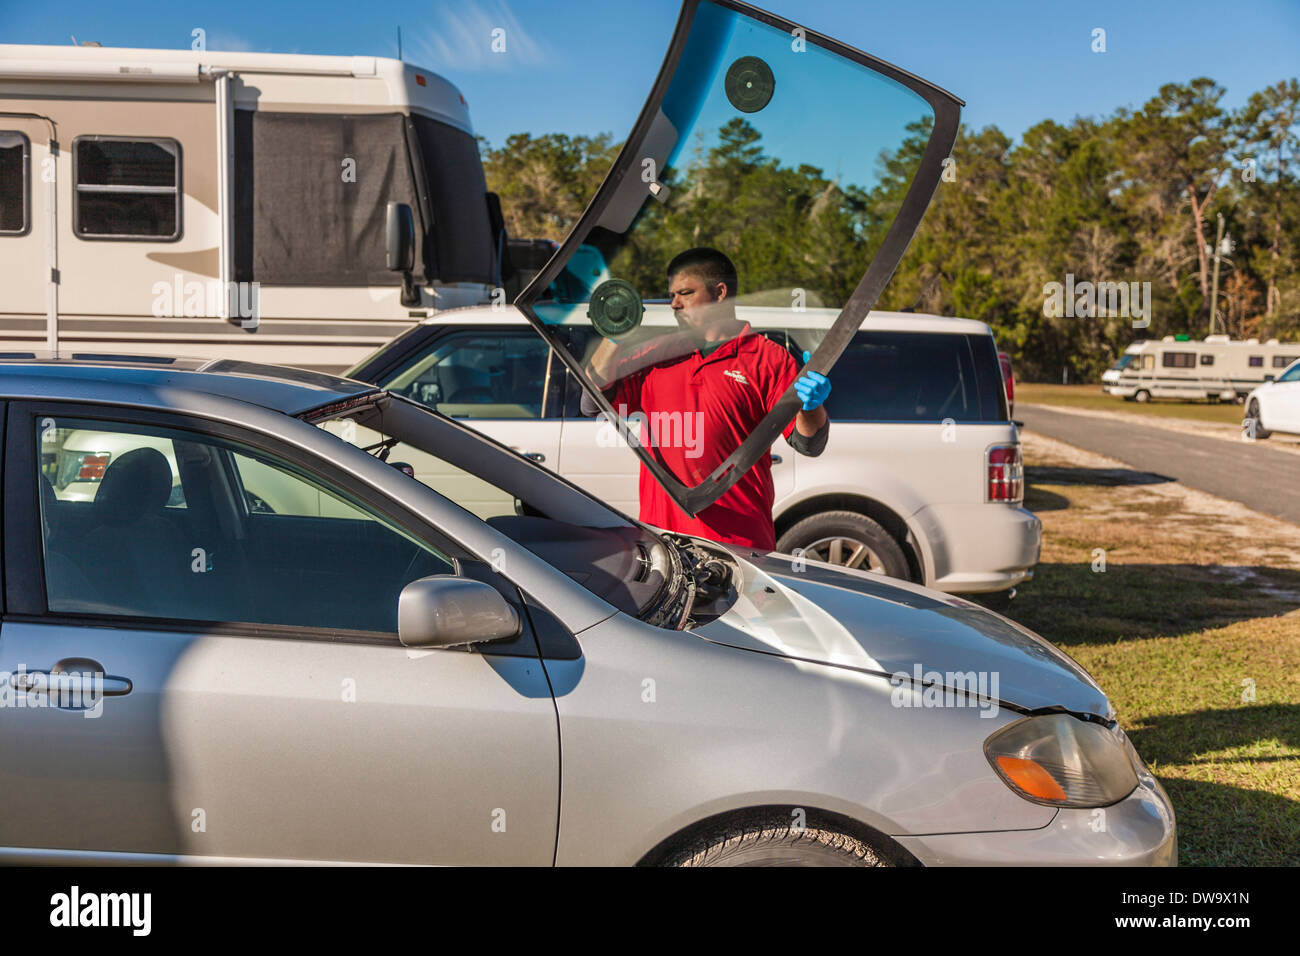 Mobile service technician replacing windshield glass on Toyota Corolla - Stock Image